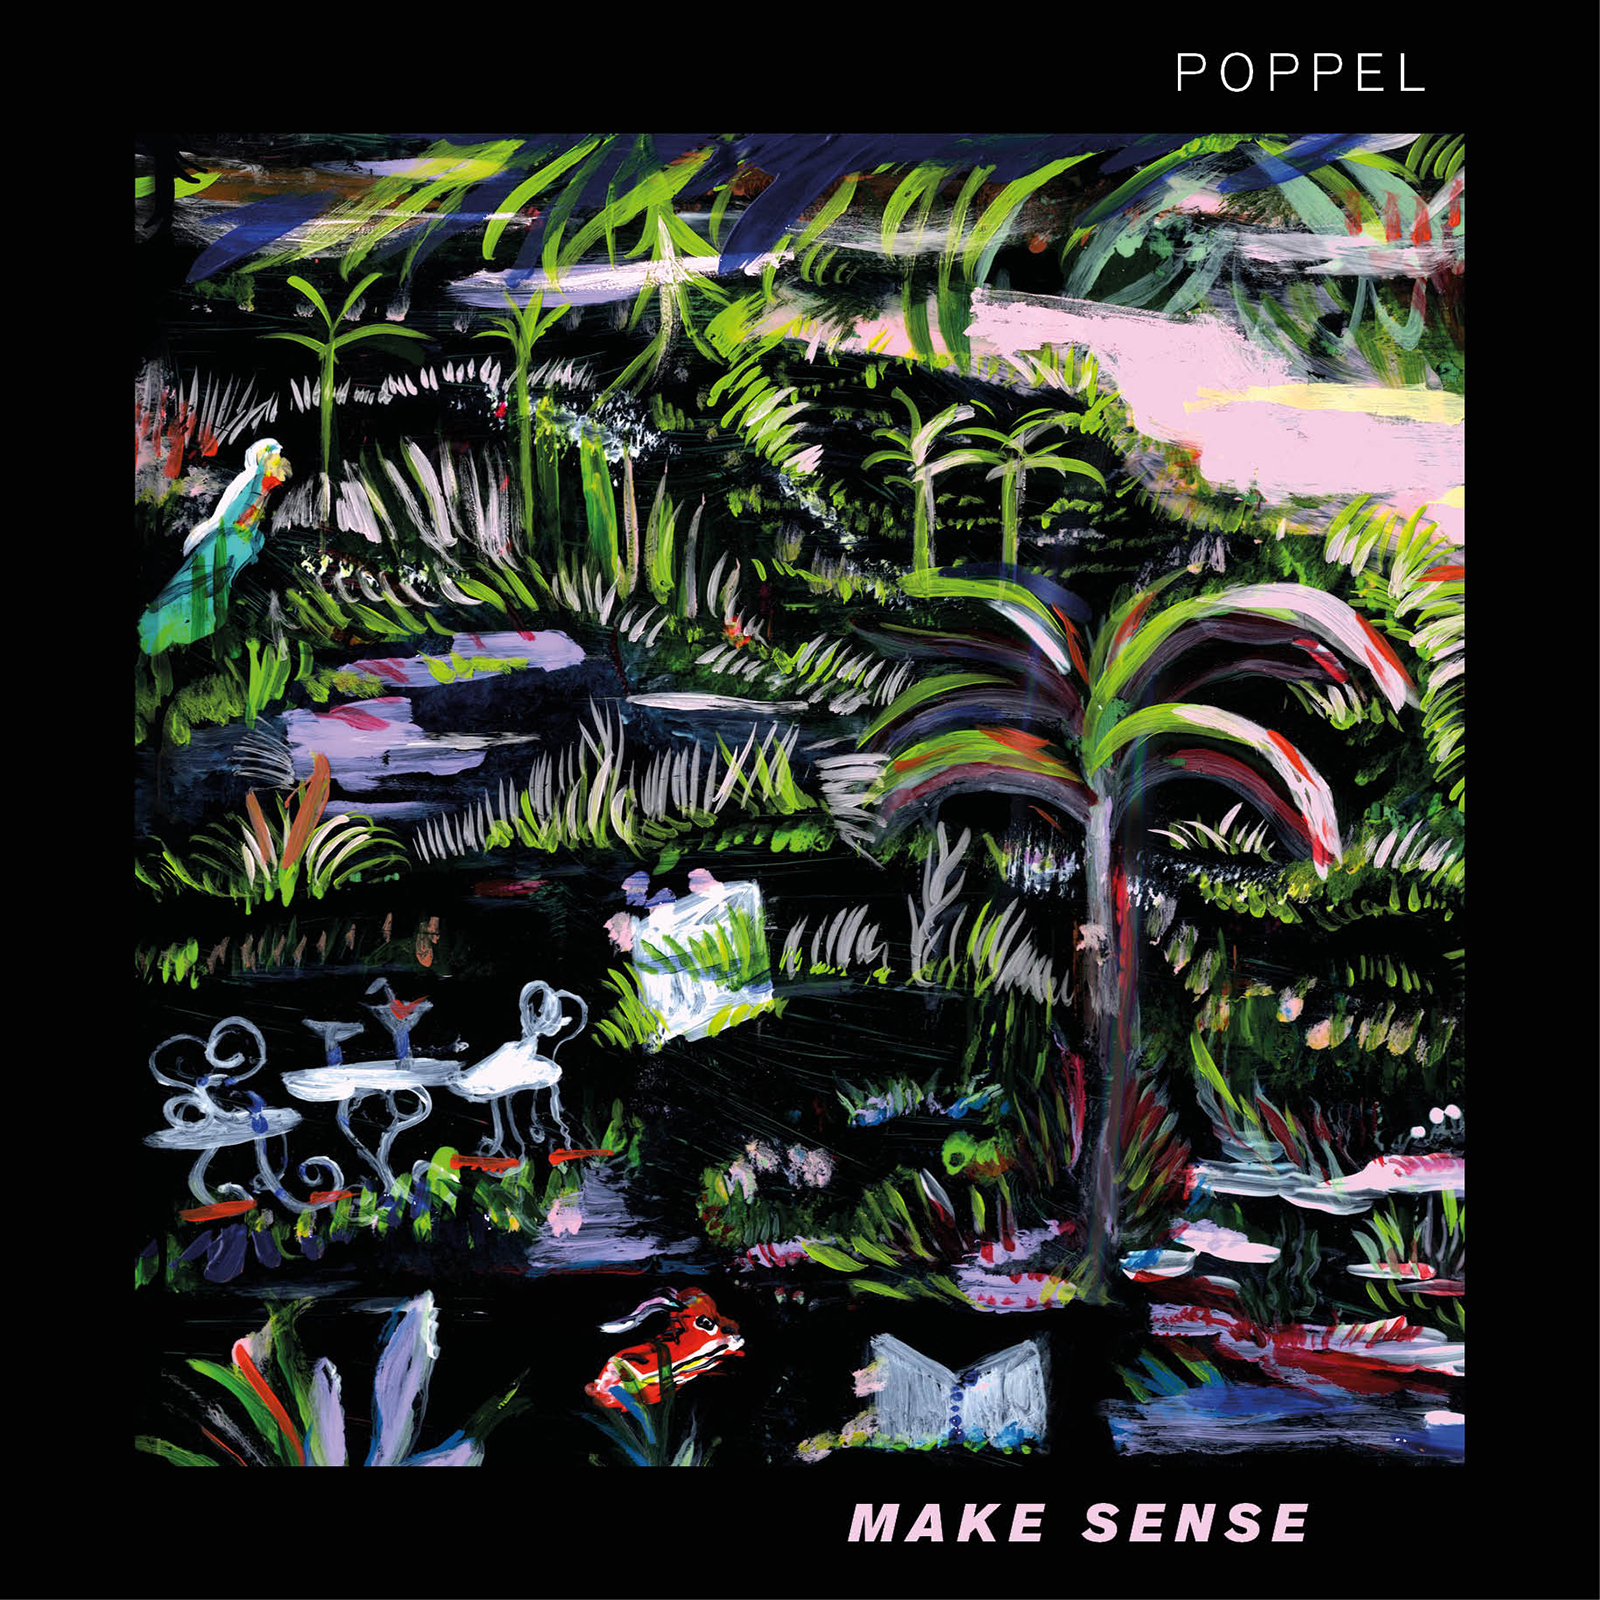 Poppel - Make Sense